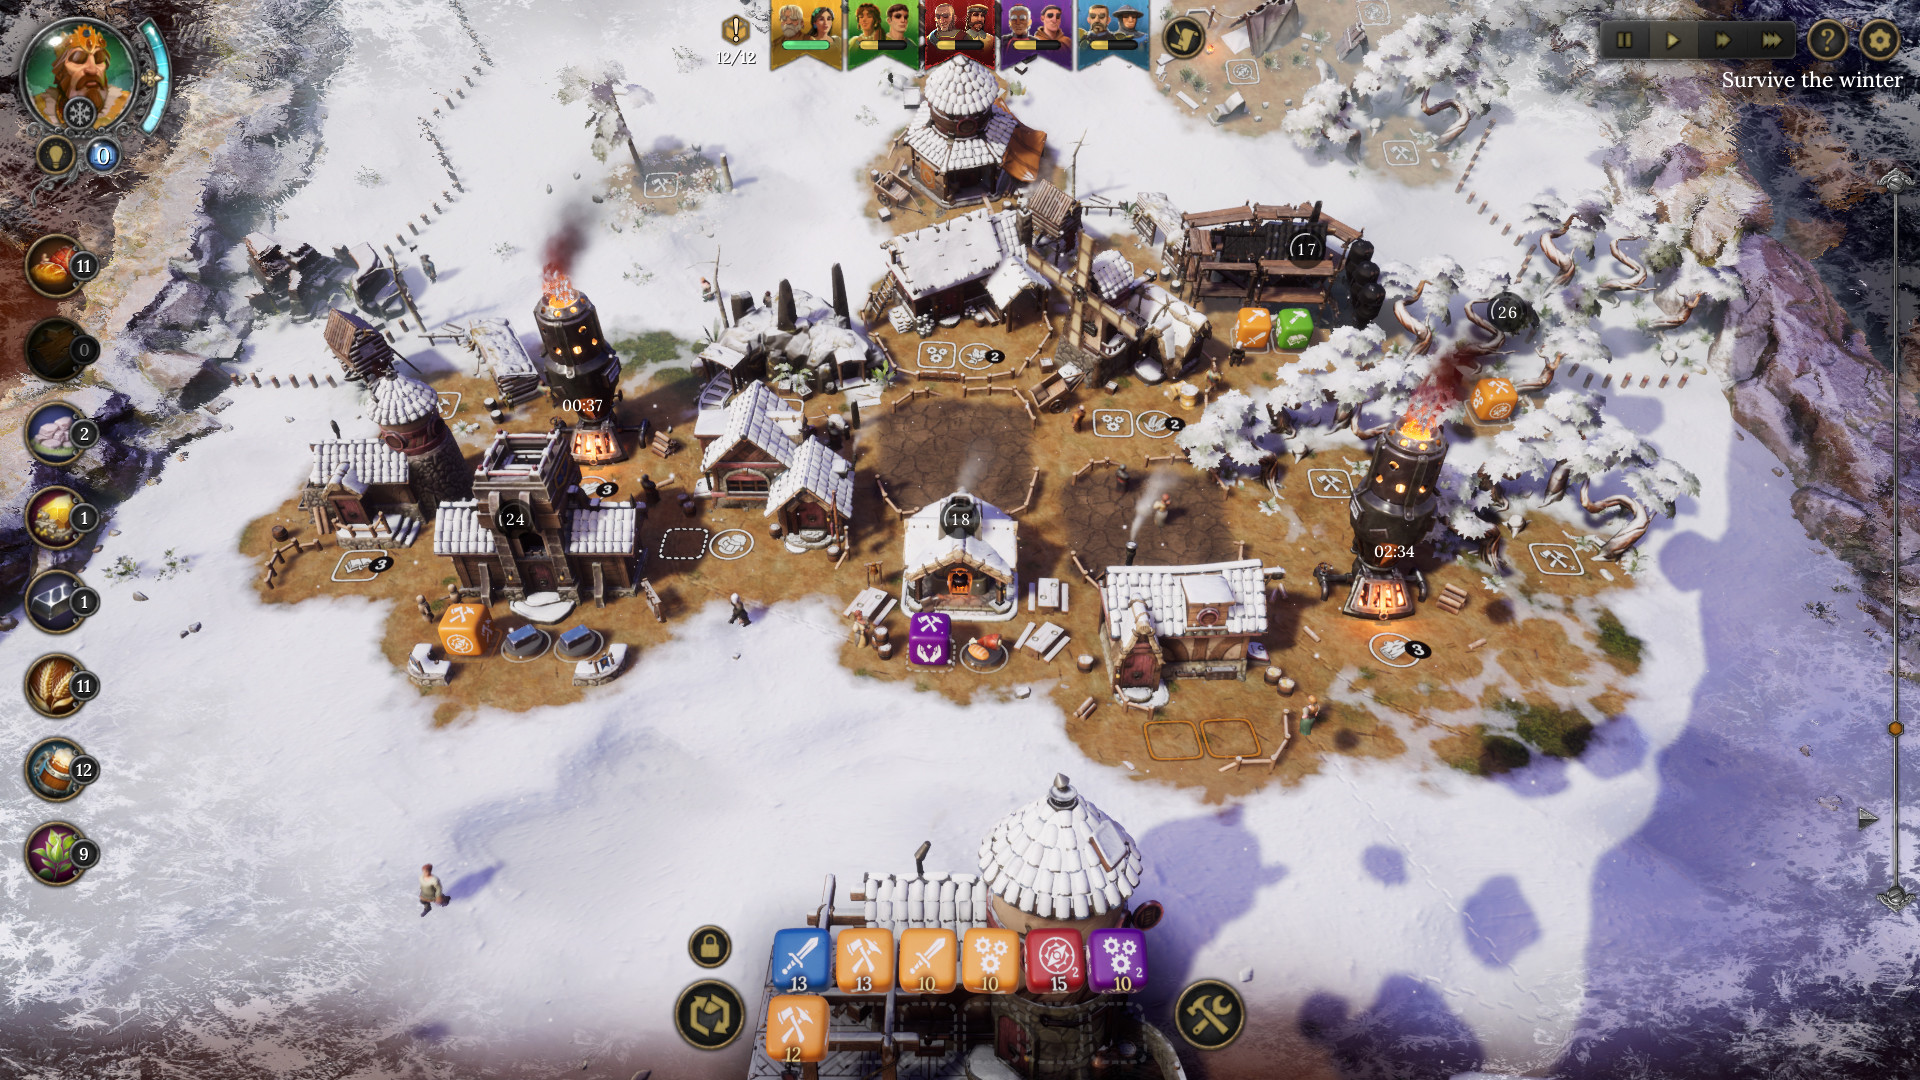 dice-legacy-deluxe-pc-screenshot-2